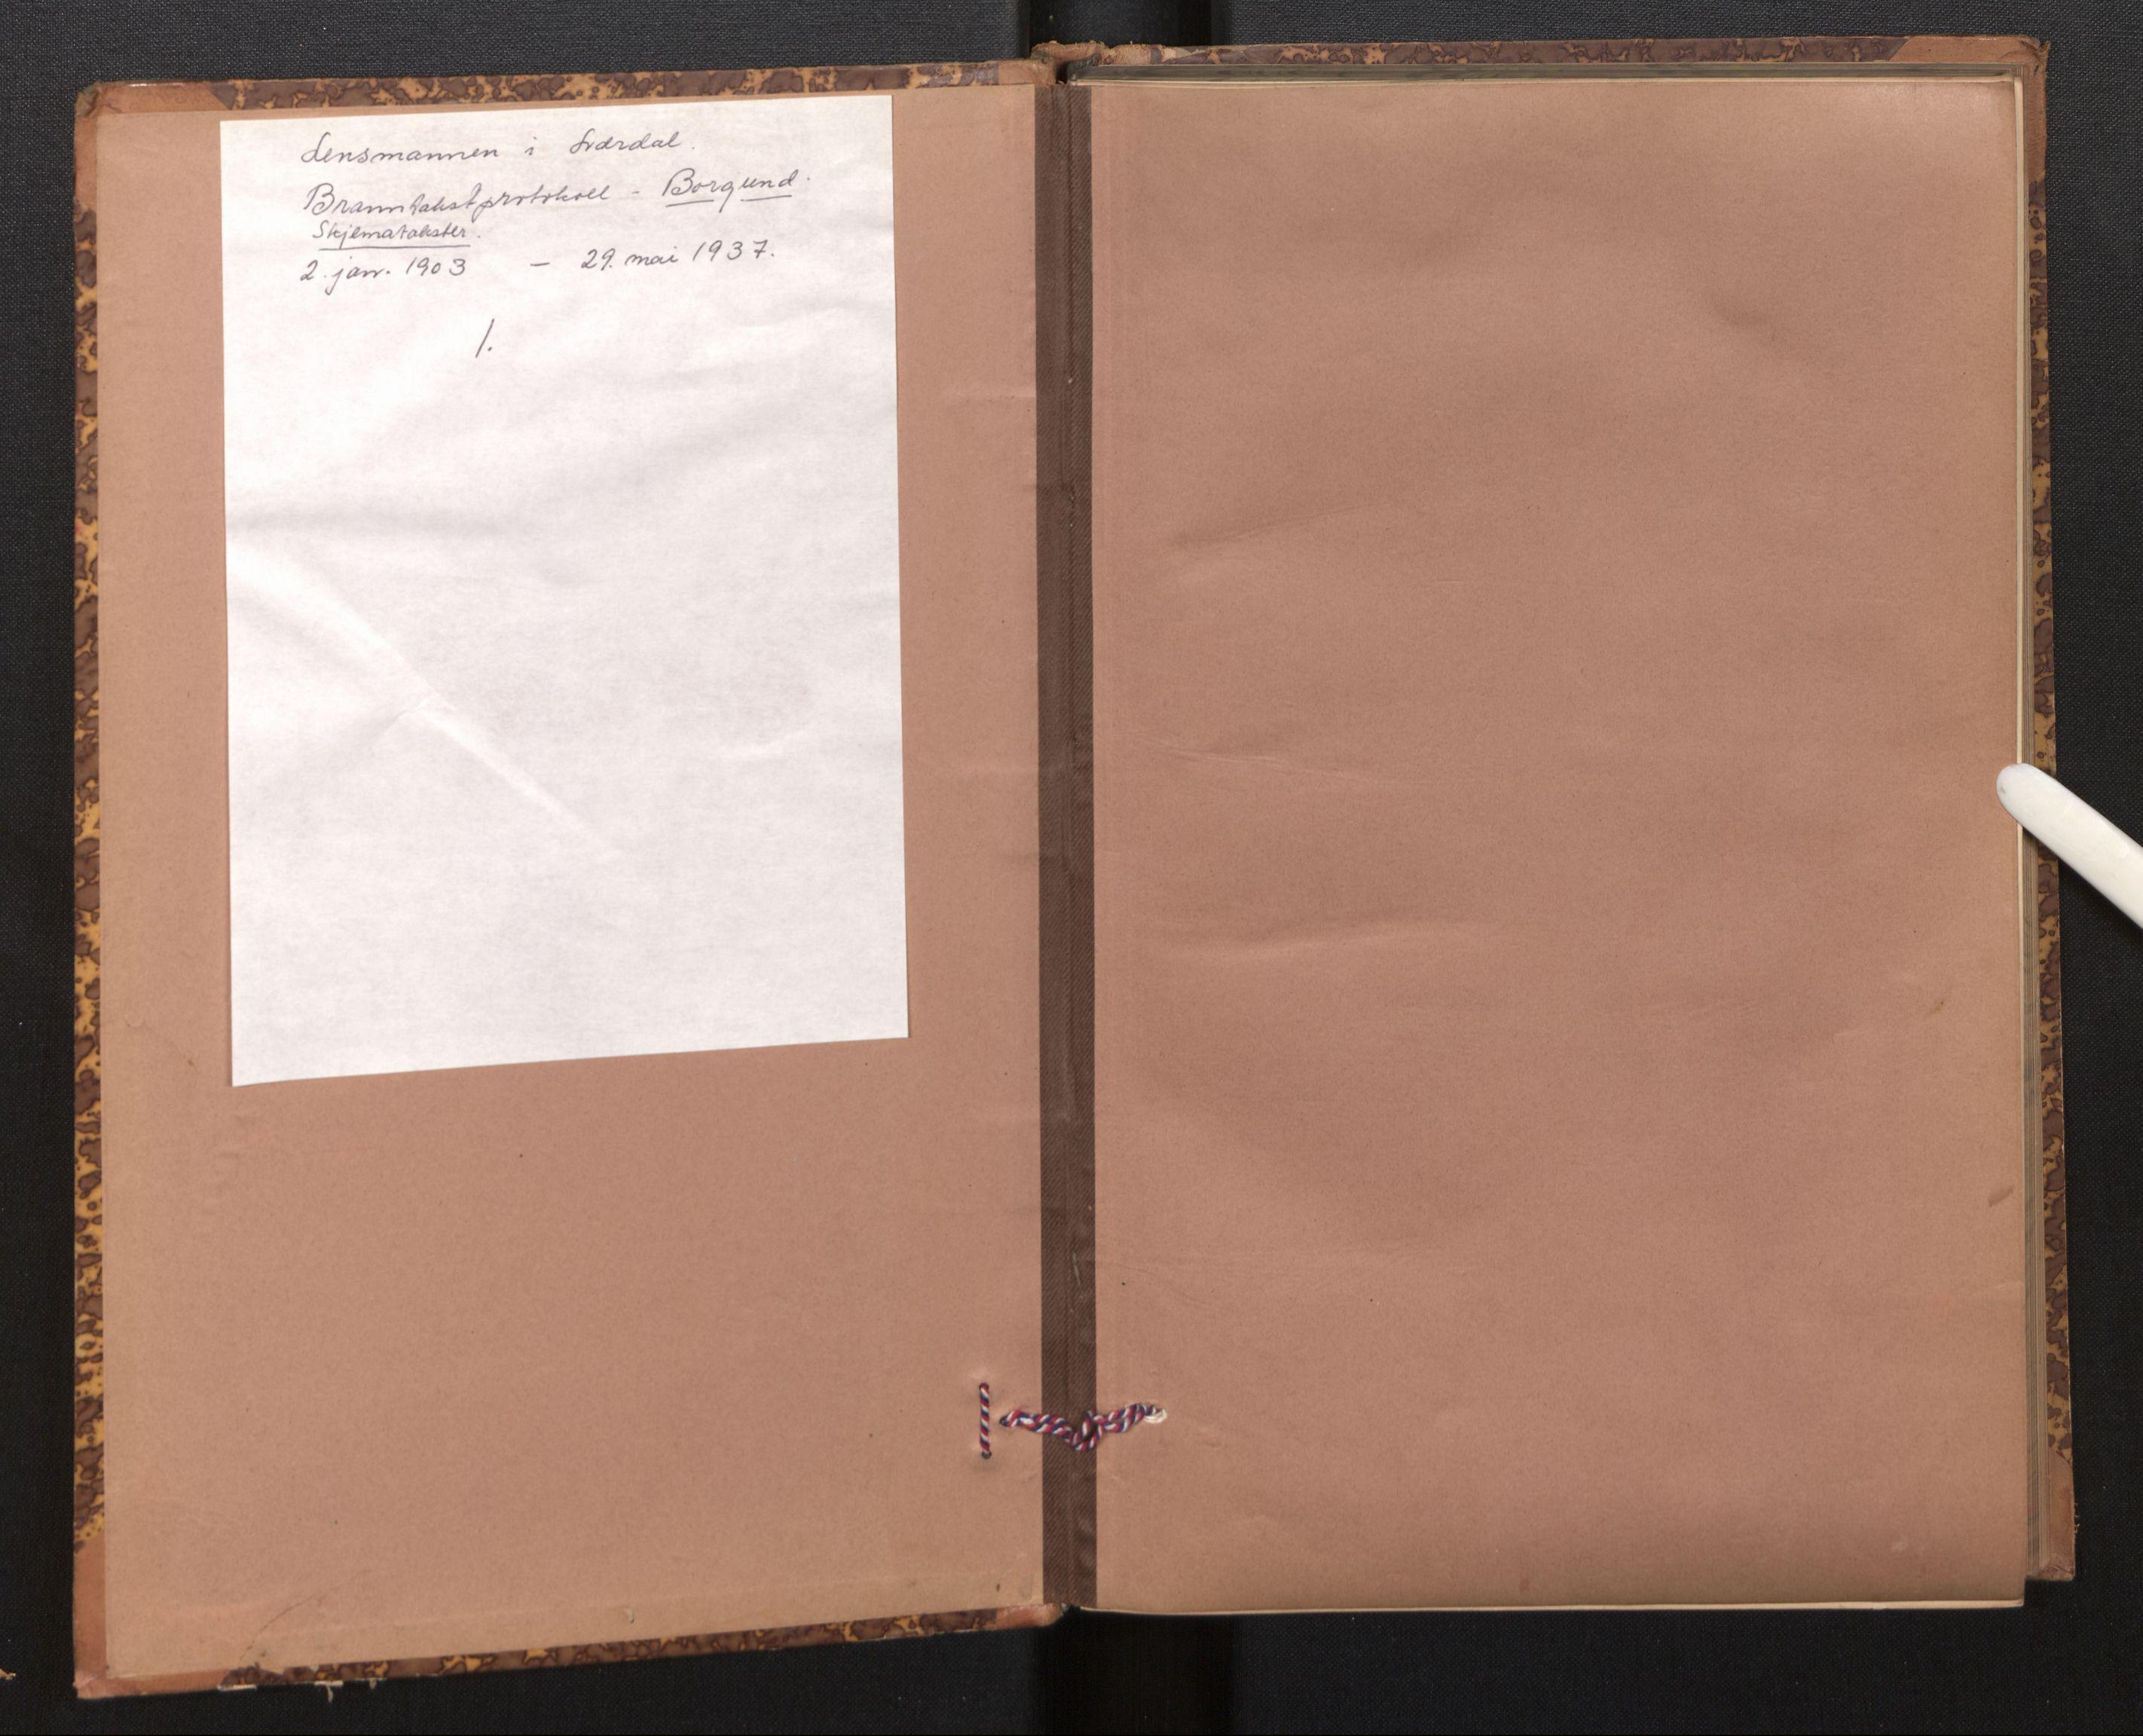 SAB, Lensmannen i Borgund, 0012/L0003: Branntakstprotokoll, skjematakst, 1903-1937